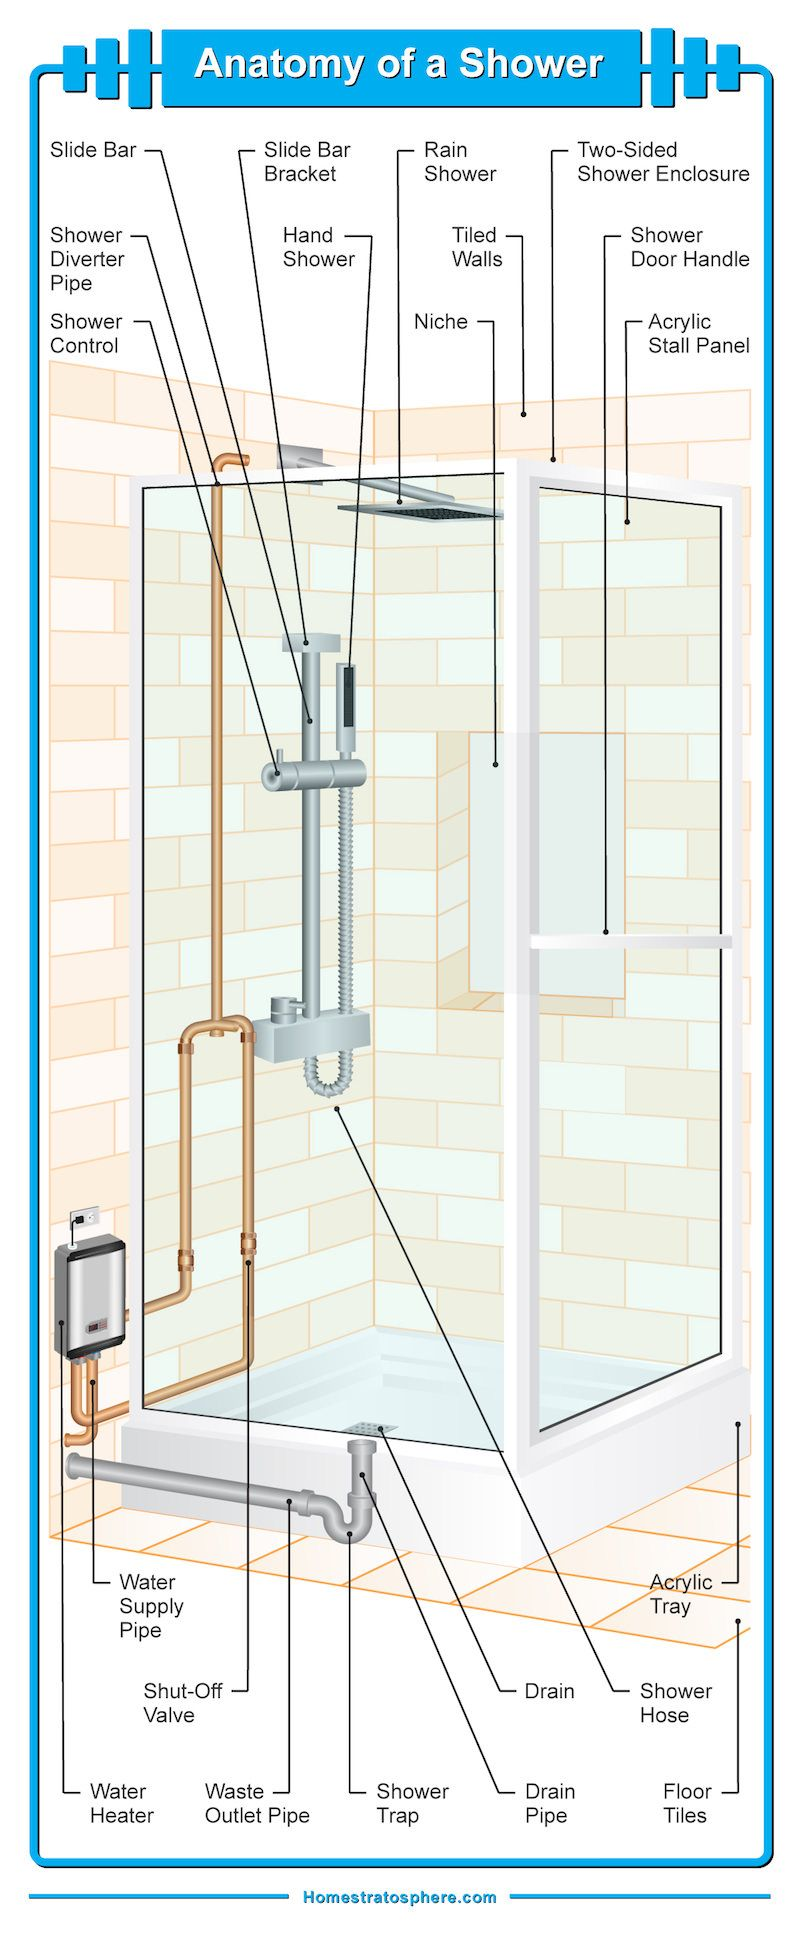 21 Parts Of A Bathroom Shower Excellent Diagram Shower Plumbing Bathroom Shower Shower Stall